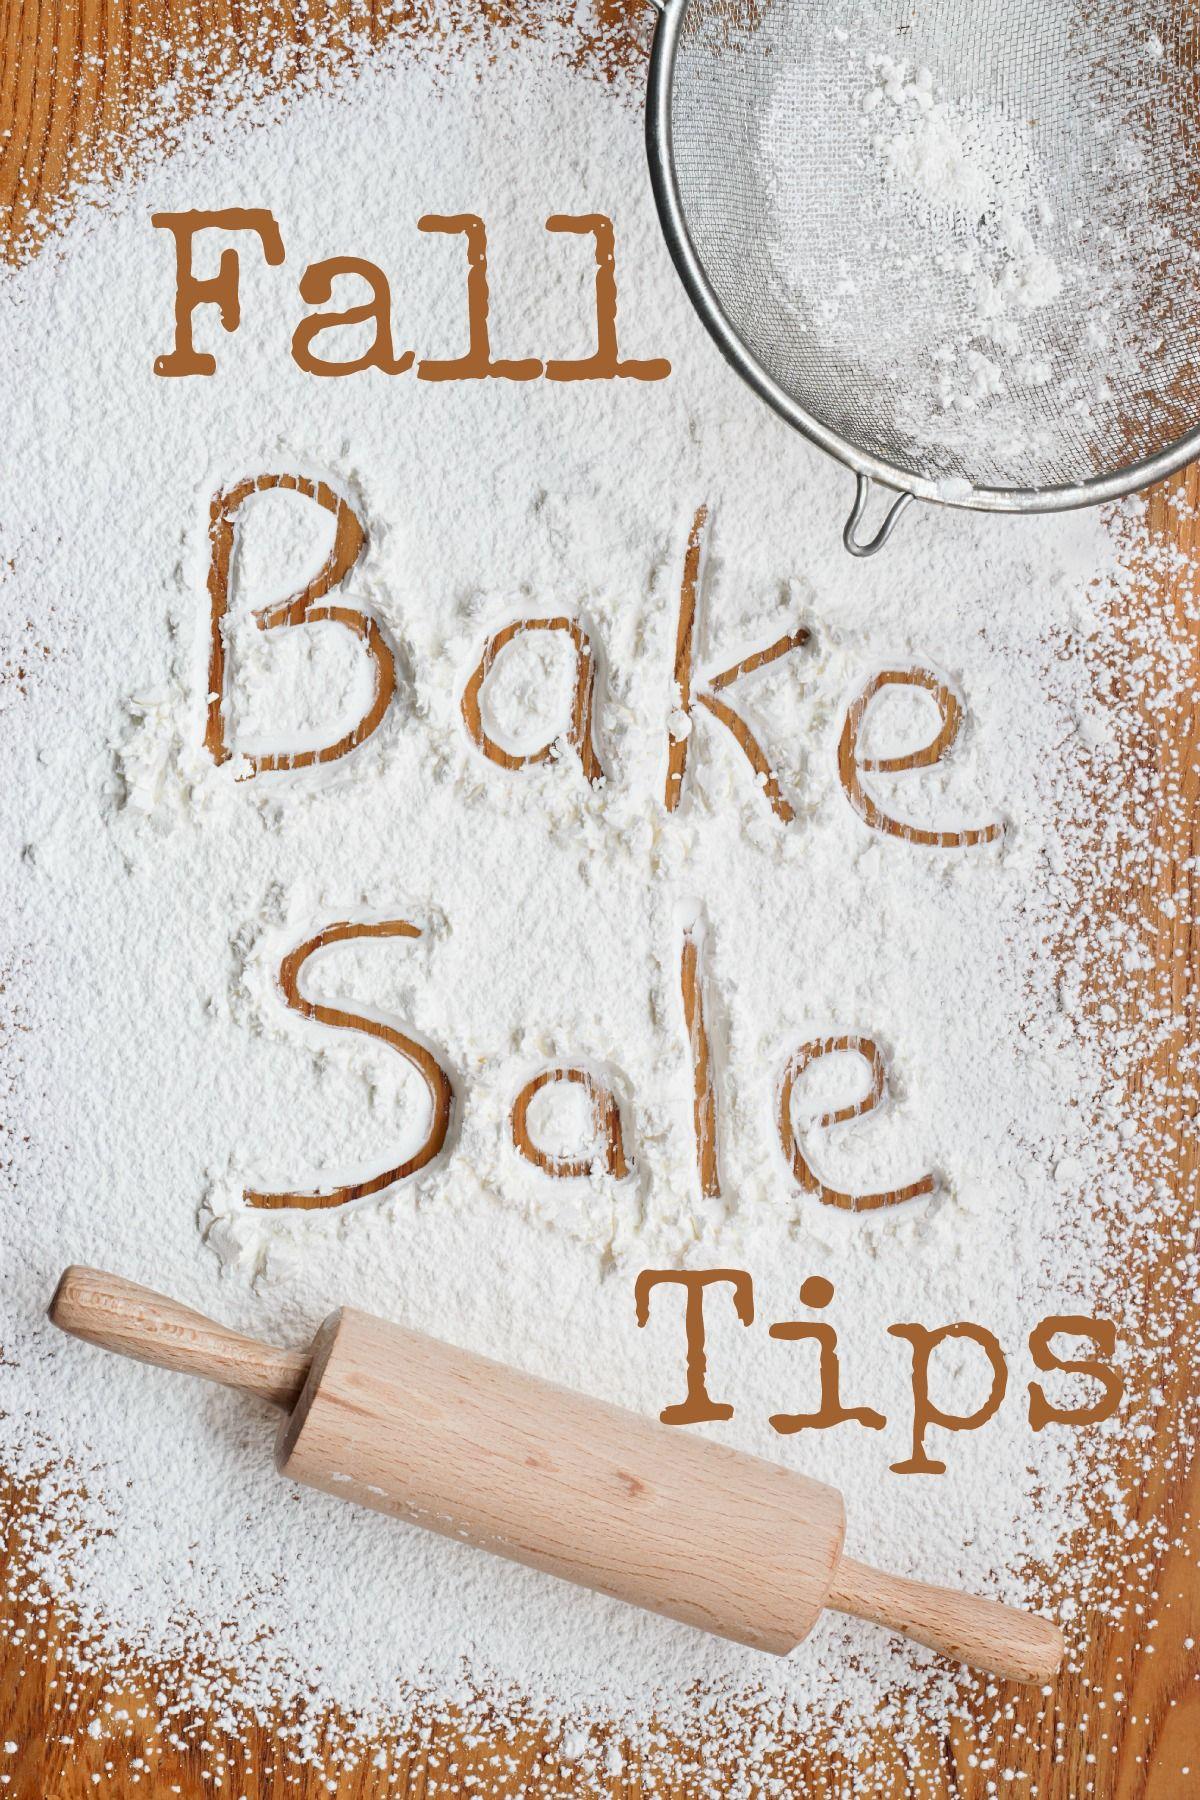 Fall Bake Sale Tips Moneymaker  Fall    Fall Bake